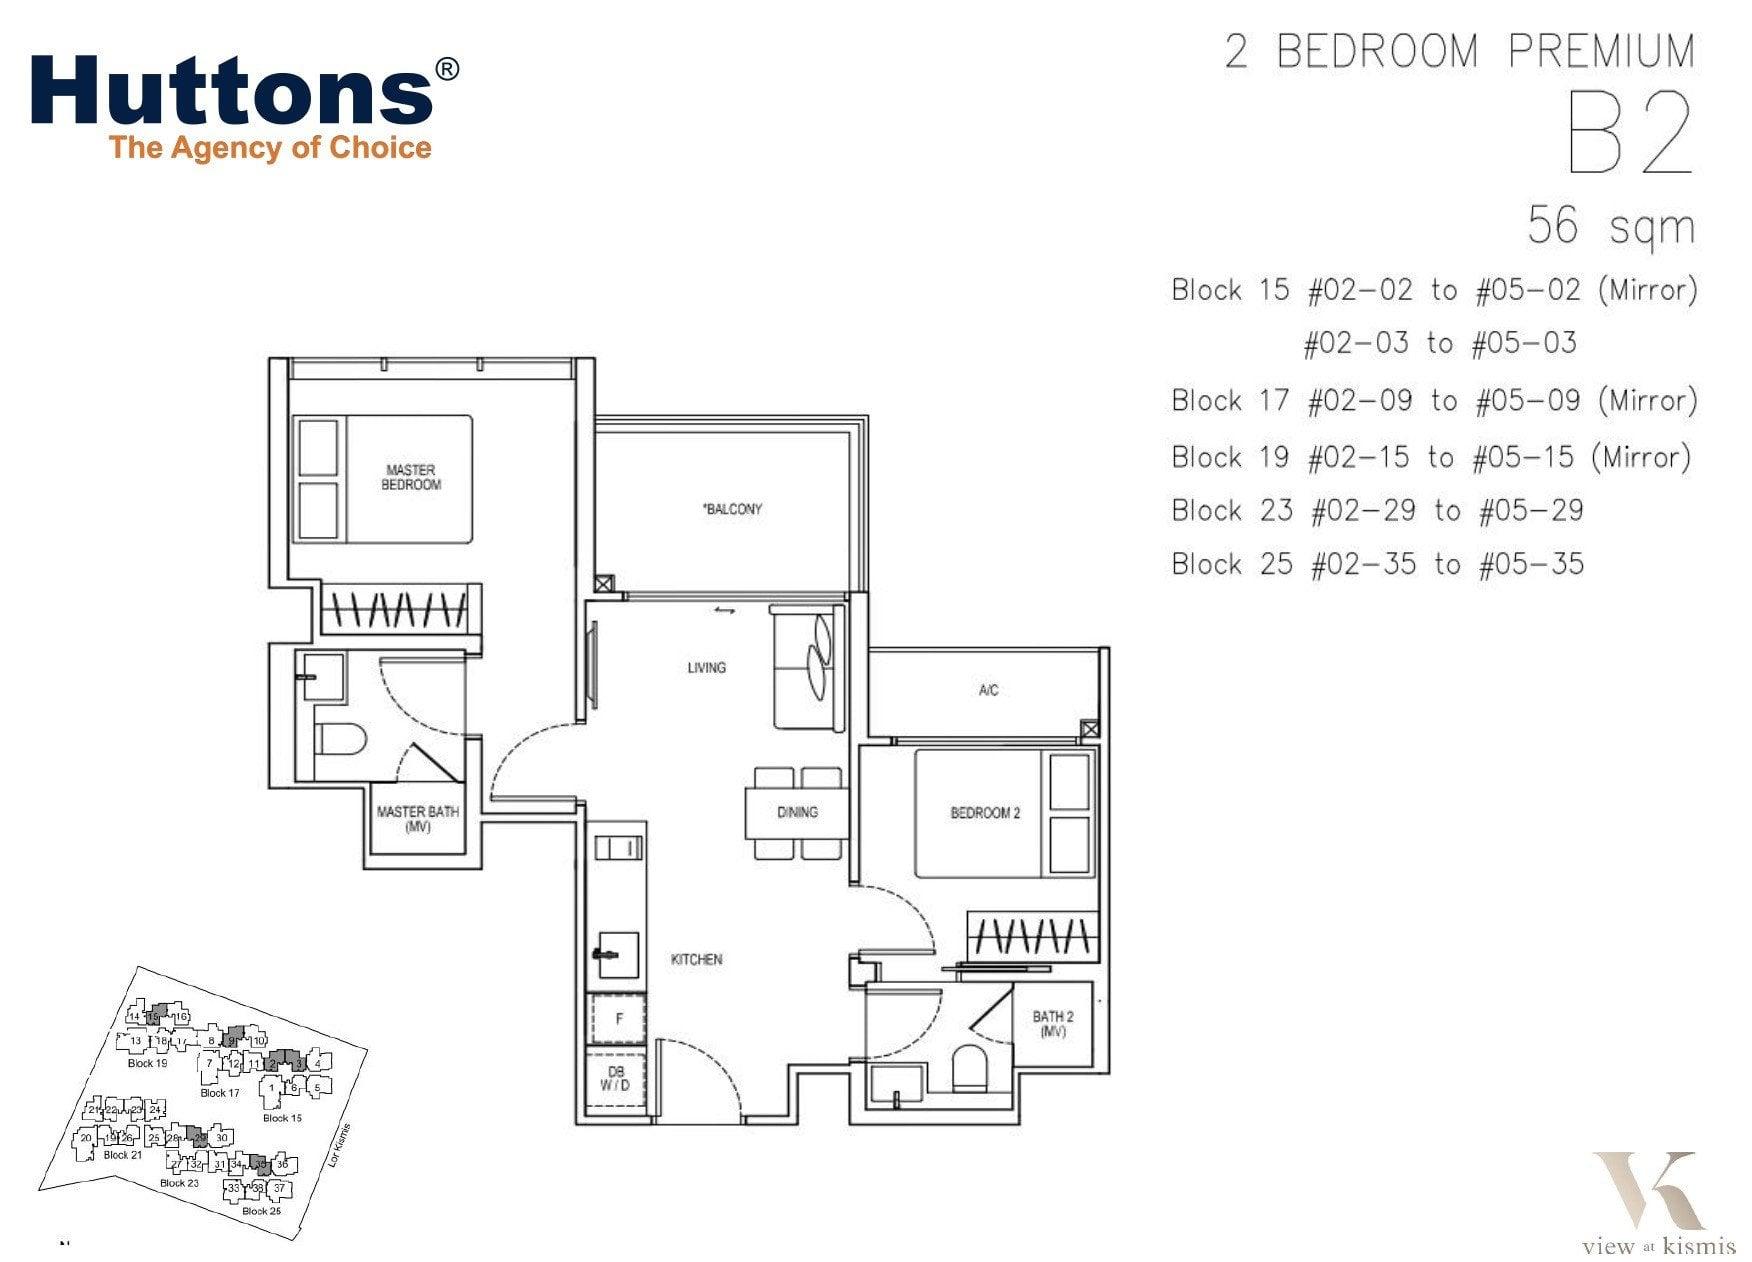 kismis-view-floorplan-2BR-premium